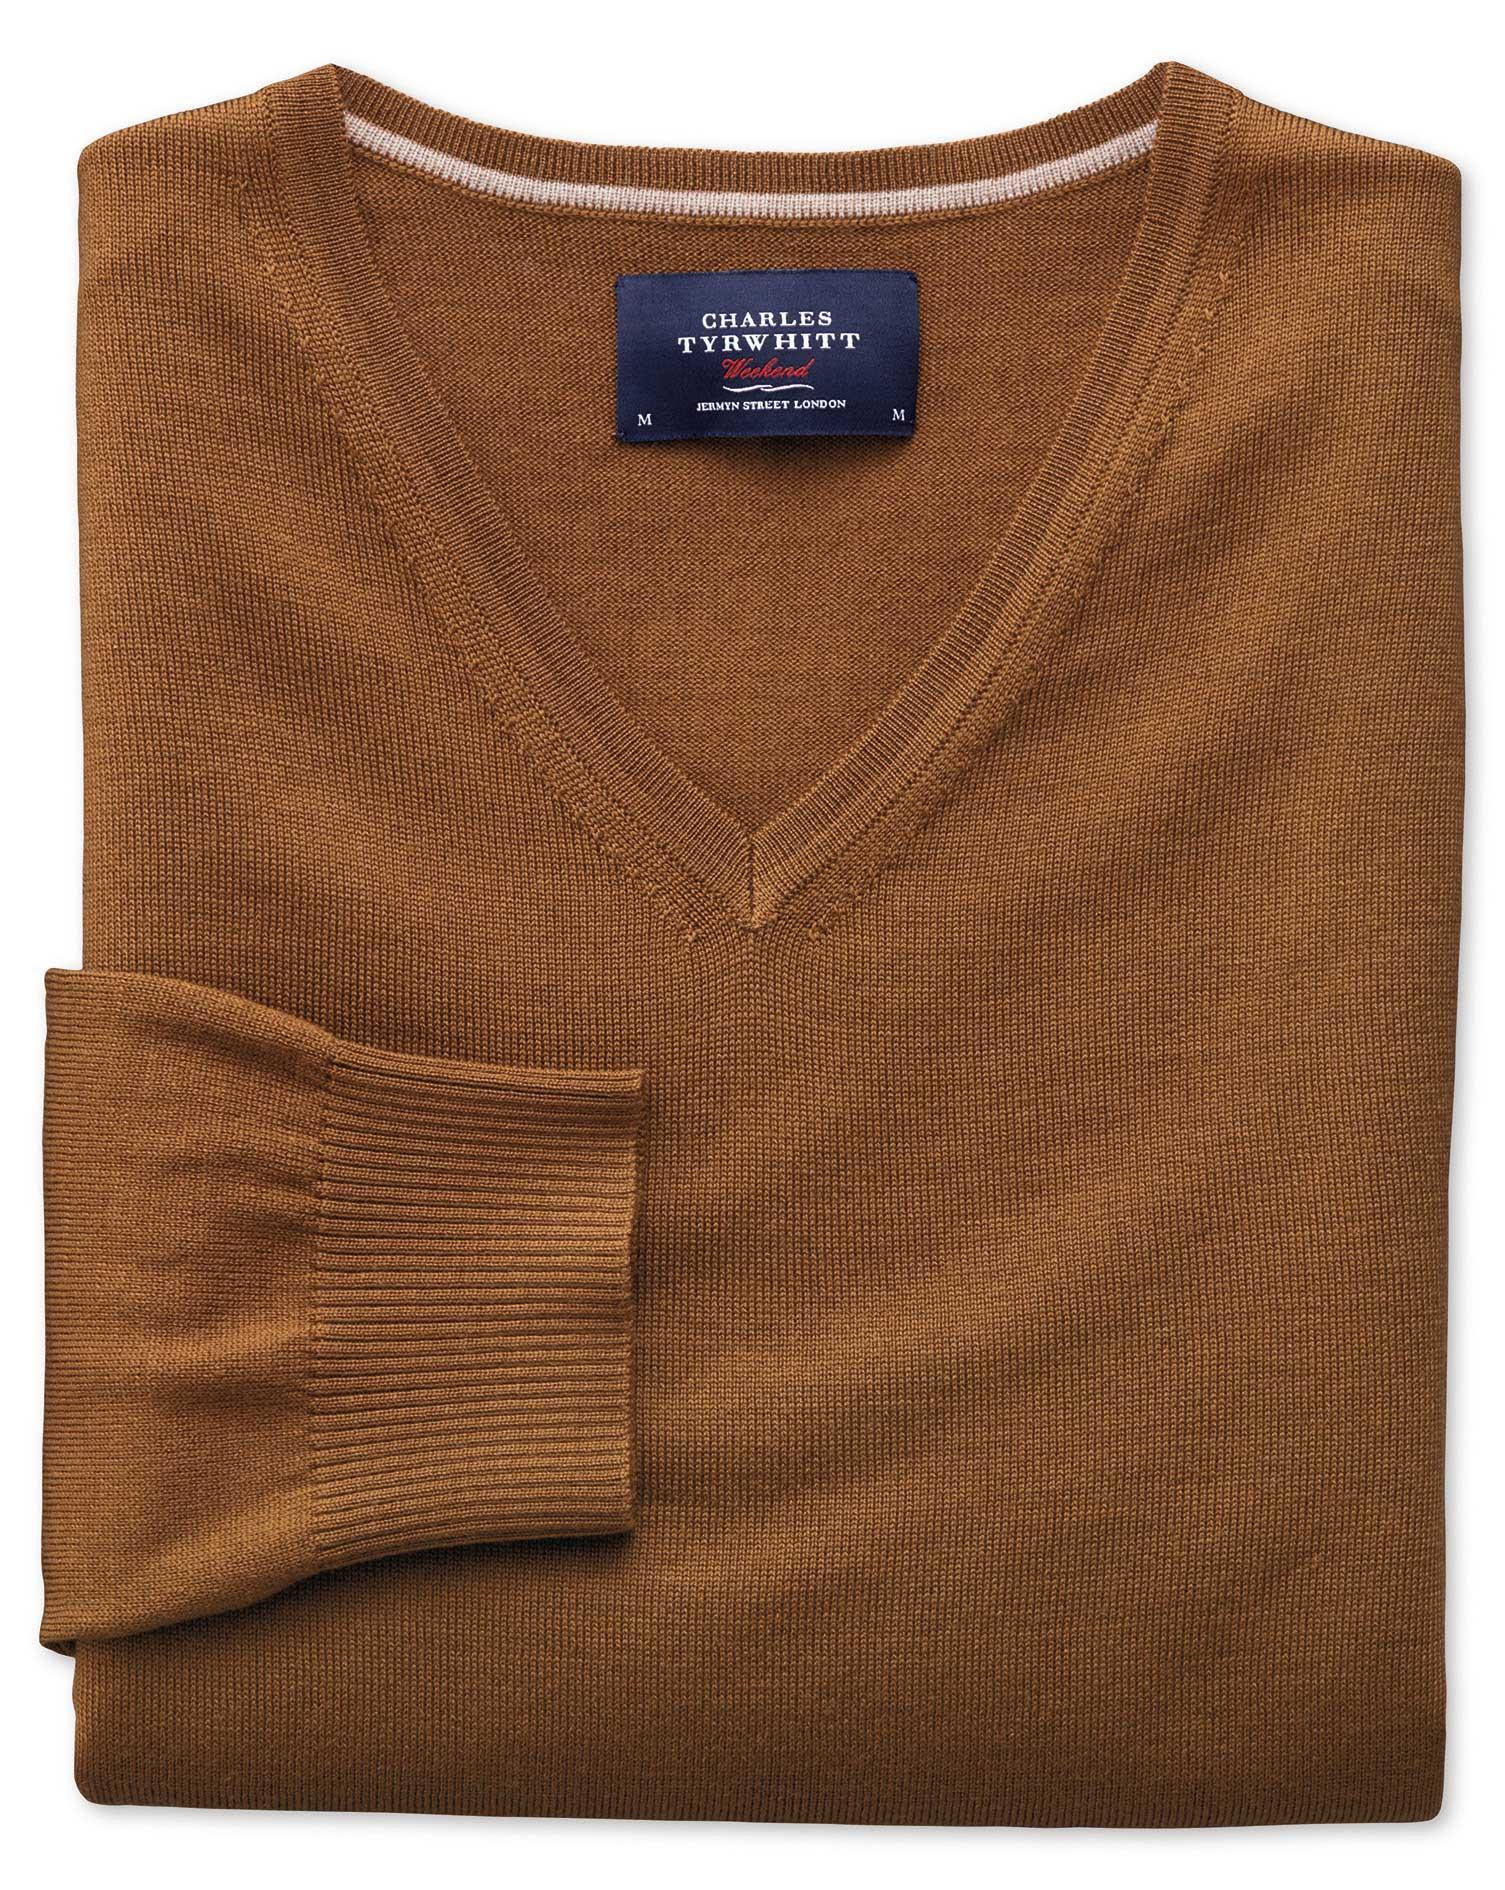 Tan Merino Wool V-Neck Jumper Size Medium by Charles Tyrwhitt